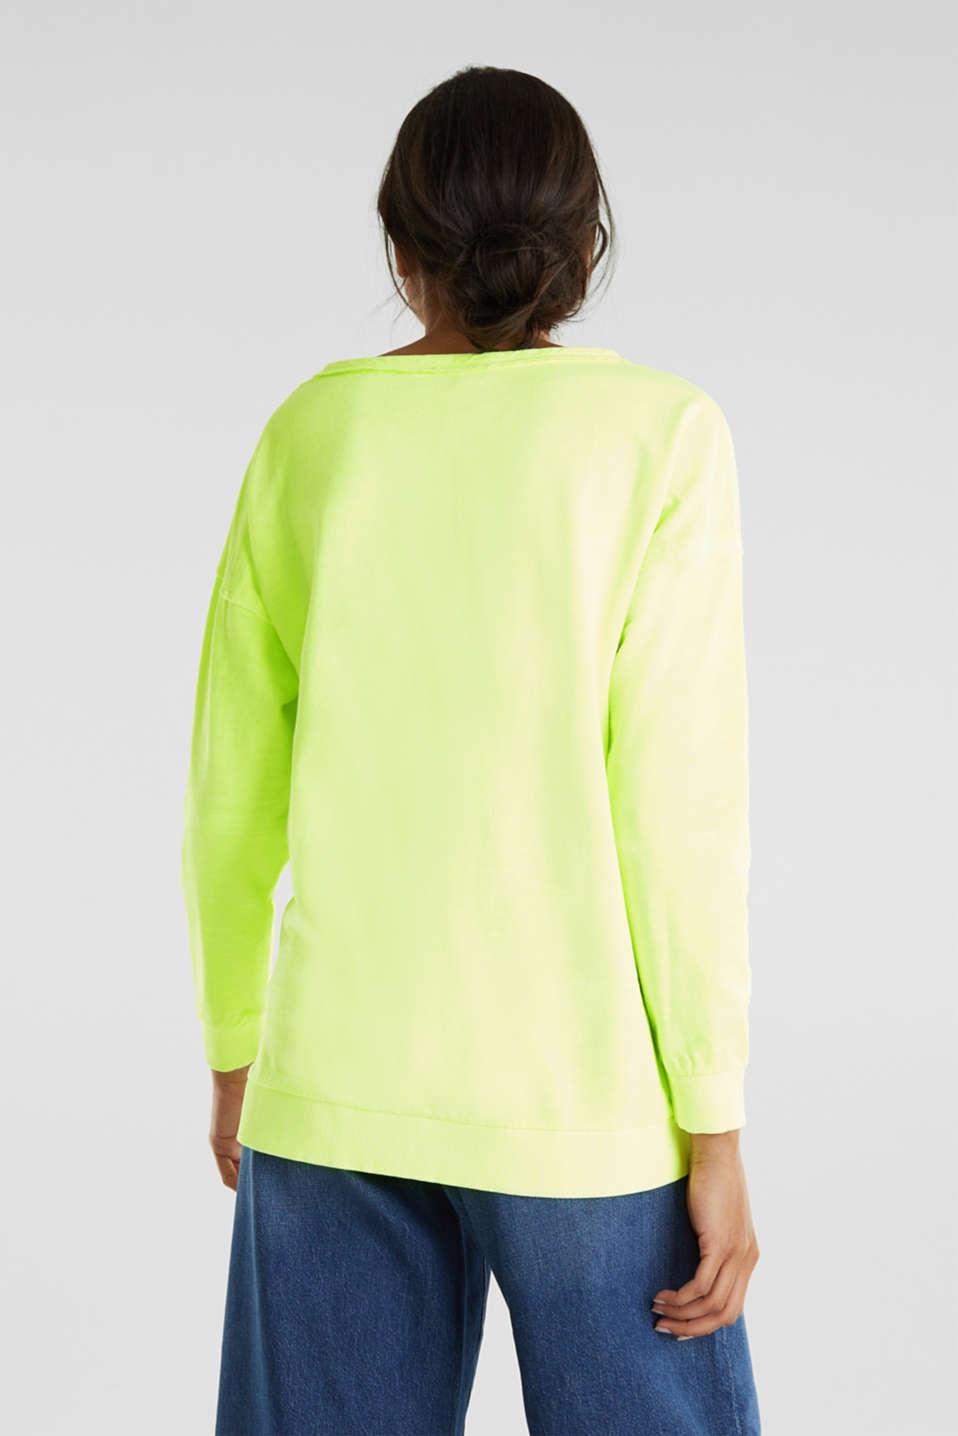 Vintage sweatshirt, LIME YELLOW, detail image number 2